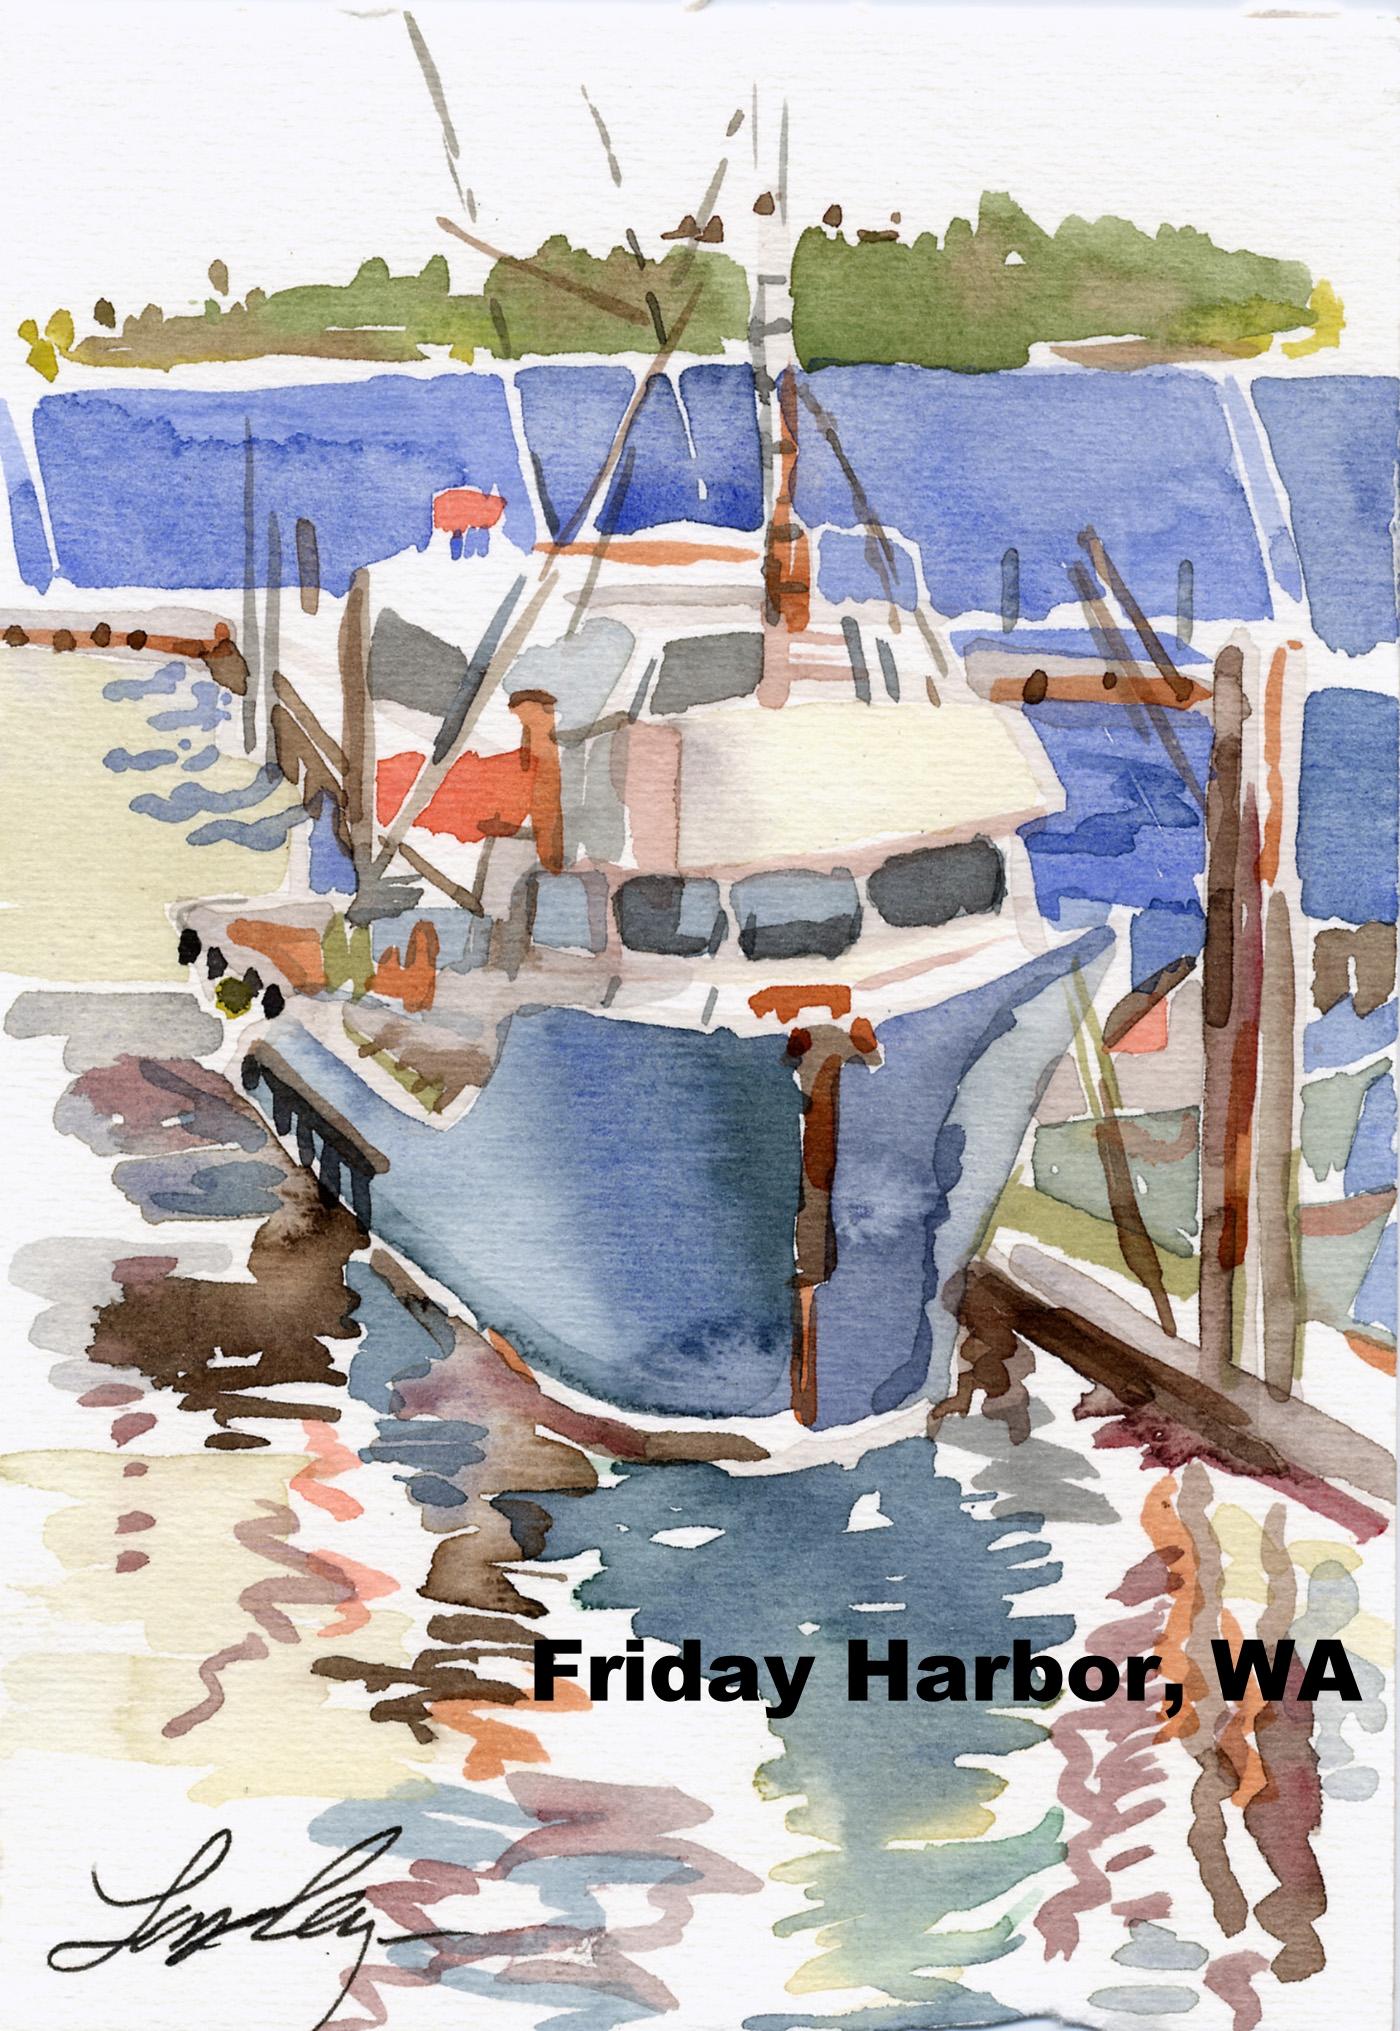 boat at Friday Harbor.jpg